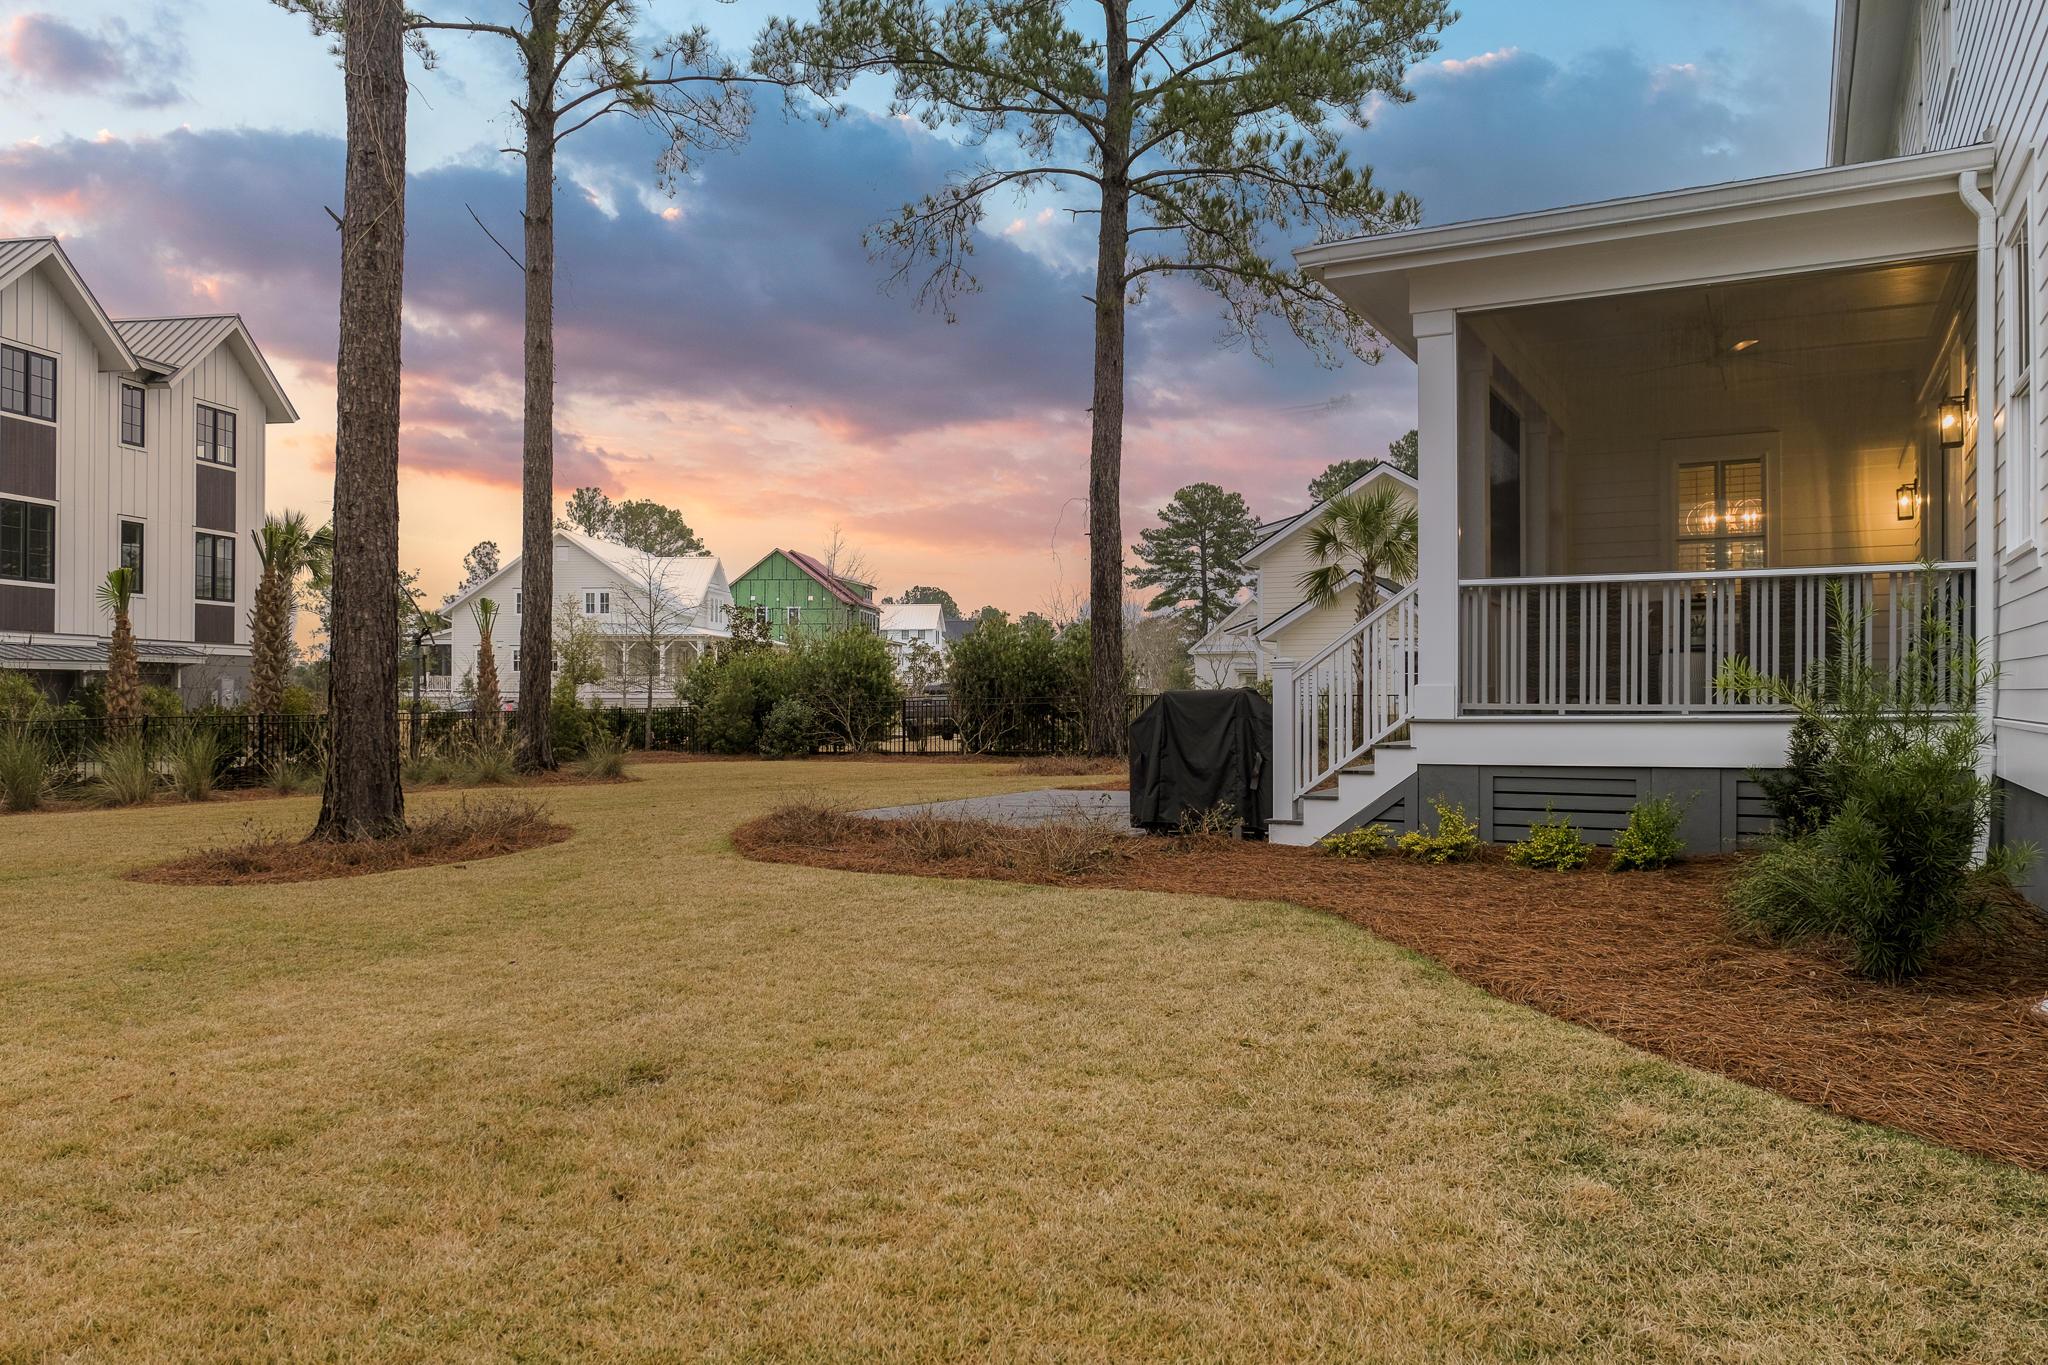 Daniel Island Park Homes For Sale - 208 Brailsford, Charleston, SC - 24